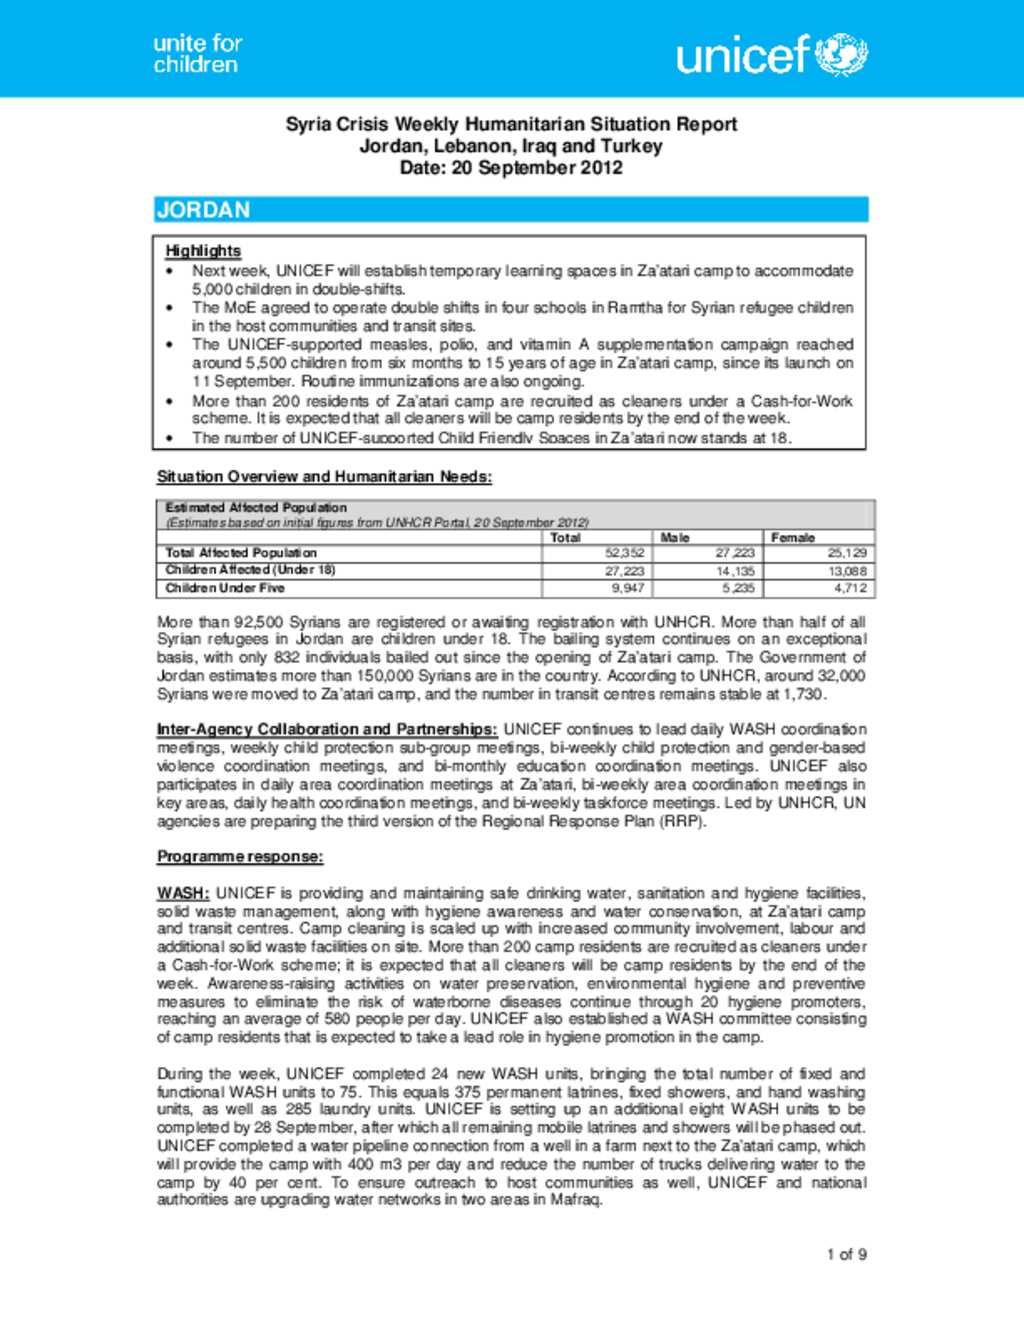 UNICEF Syria Crisis Weekly Humanitarian Situation Report Jordan, Lebanon,  Iraq And Turkey